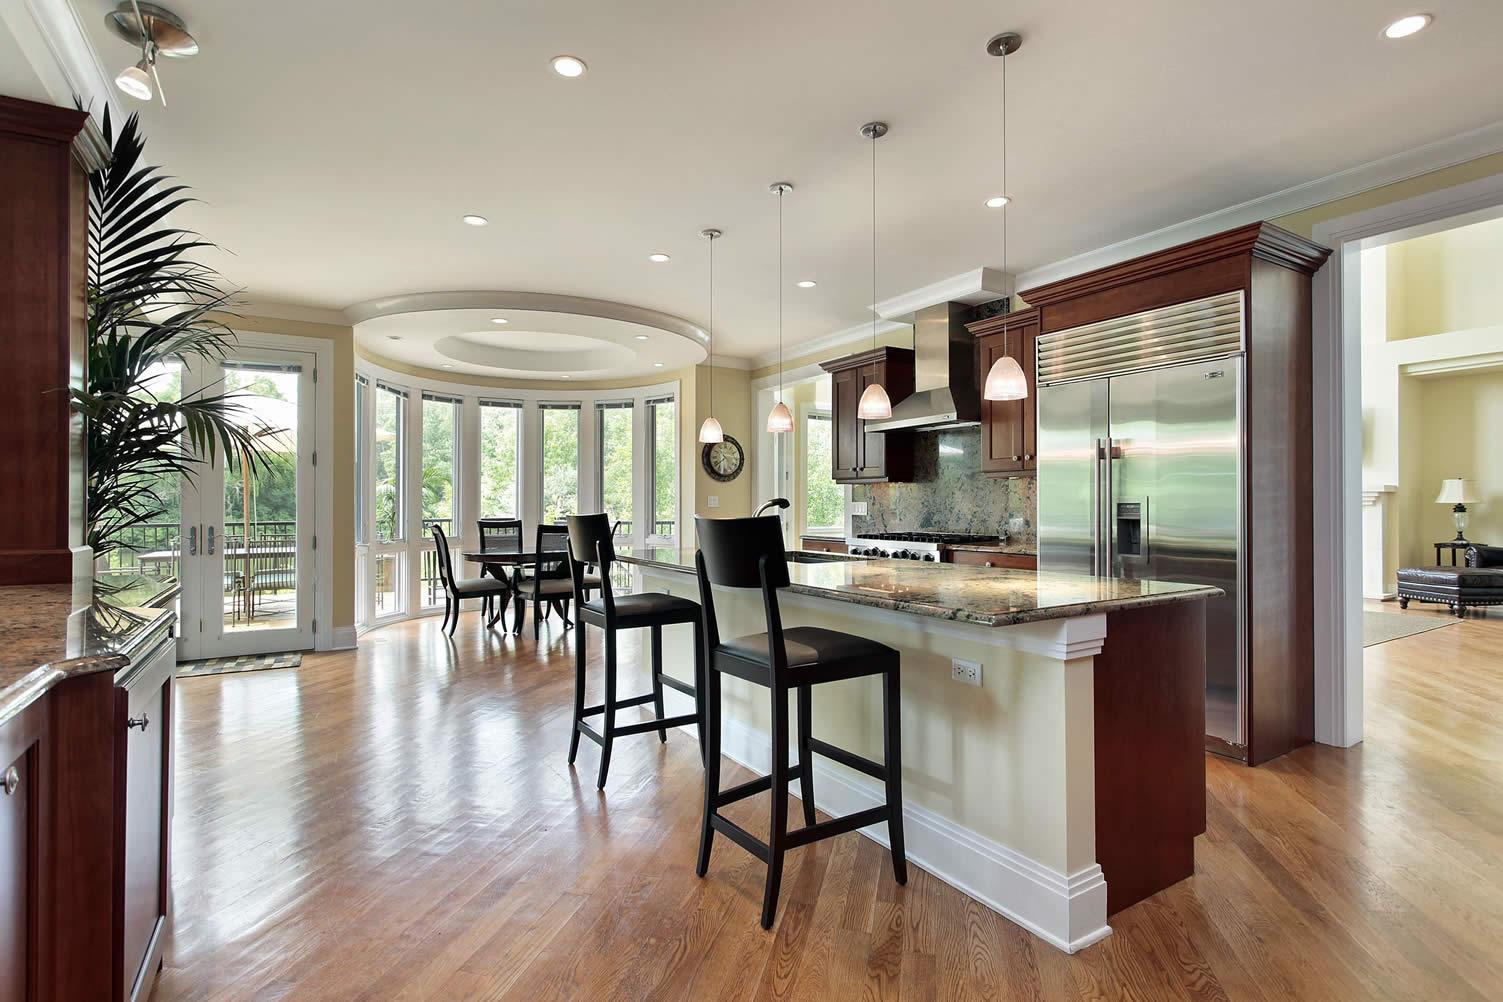 kitchen countertop stools